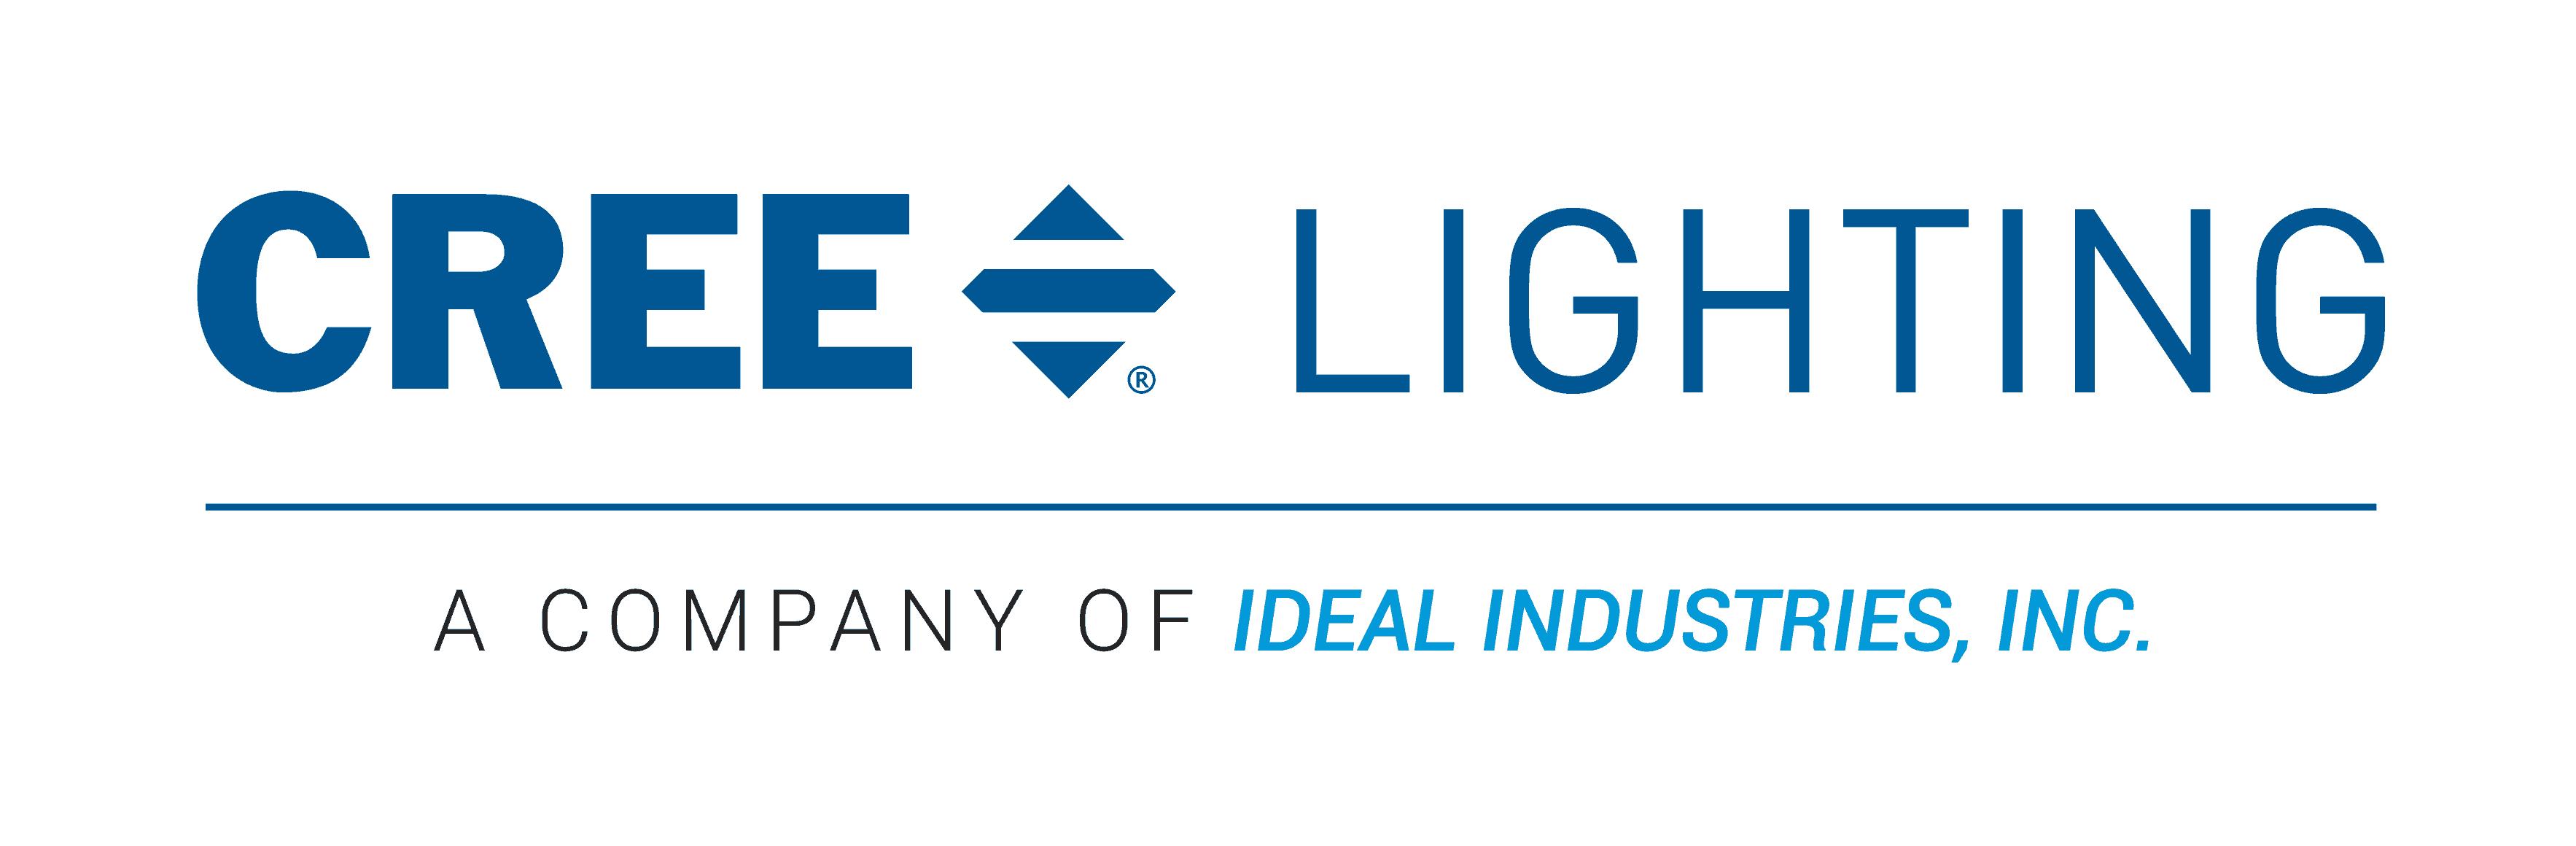 Best Solar Street Lights Manufacturer cree